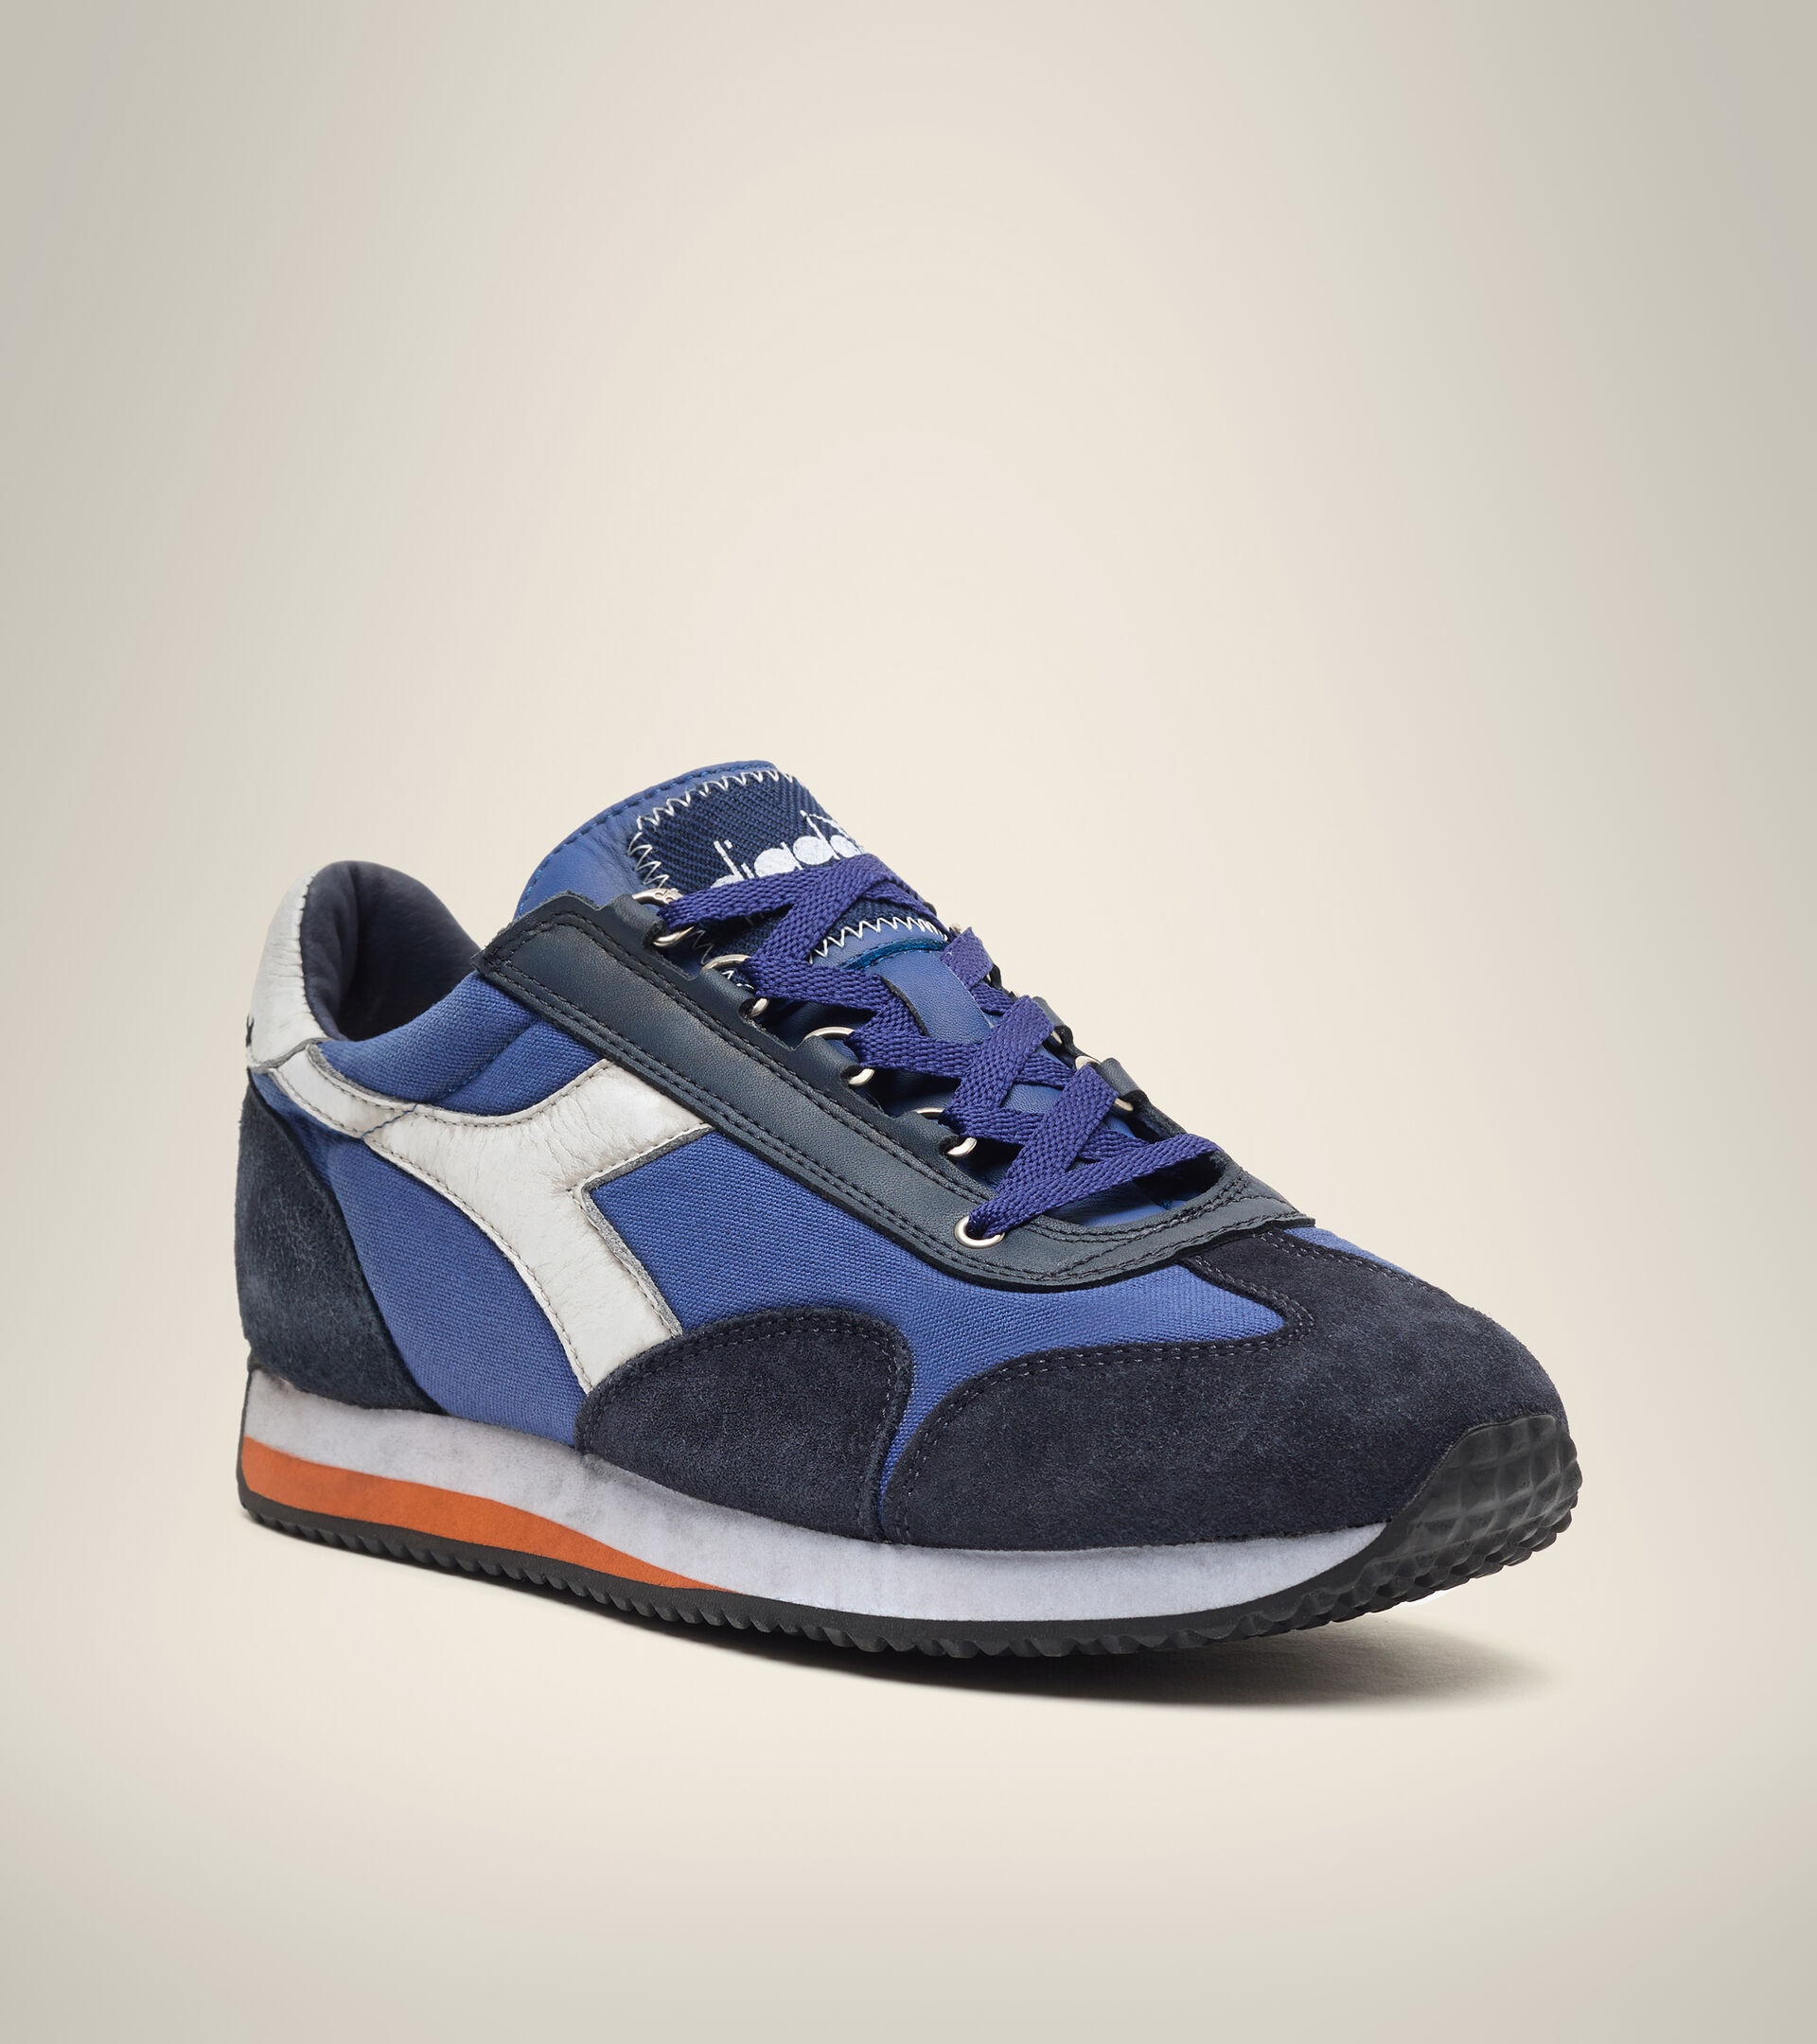 Footwear Heritage UNISEX EQUIPE H DIRTY STONE WASH EVO BLUE LIMONGES Diadora